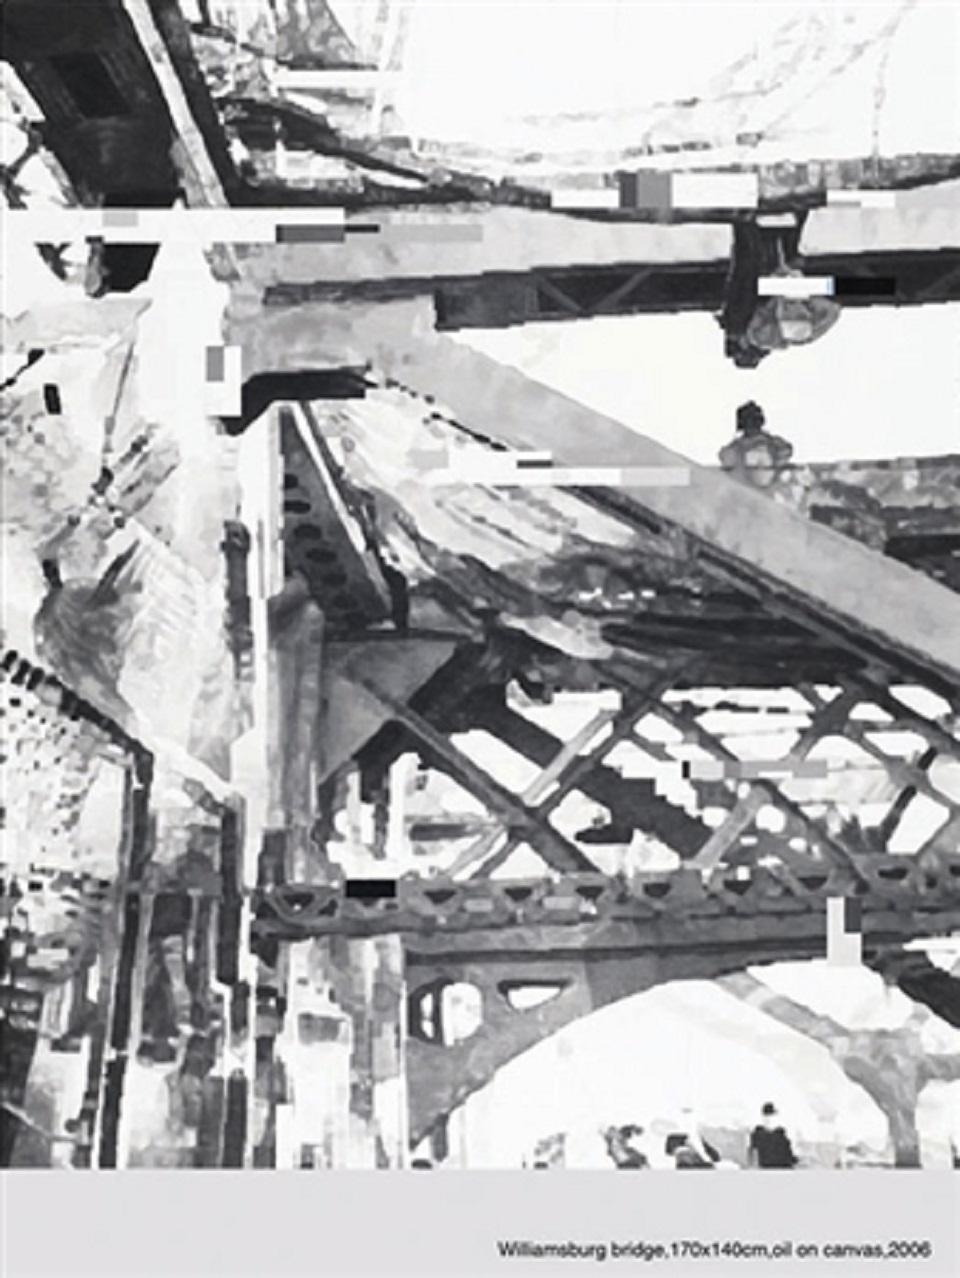 Miha Štrukelj – Williamsburg bridge